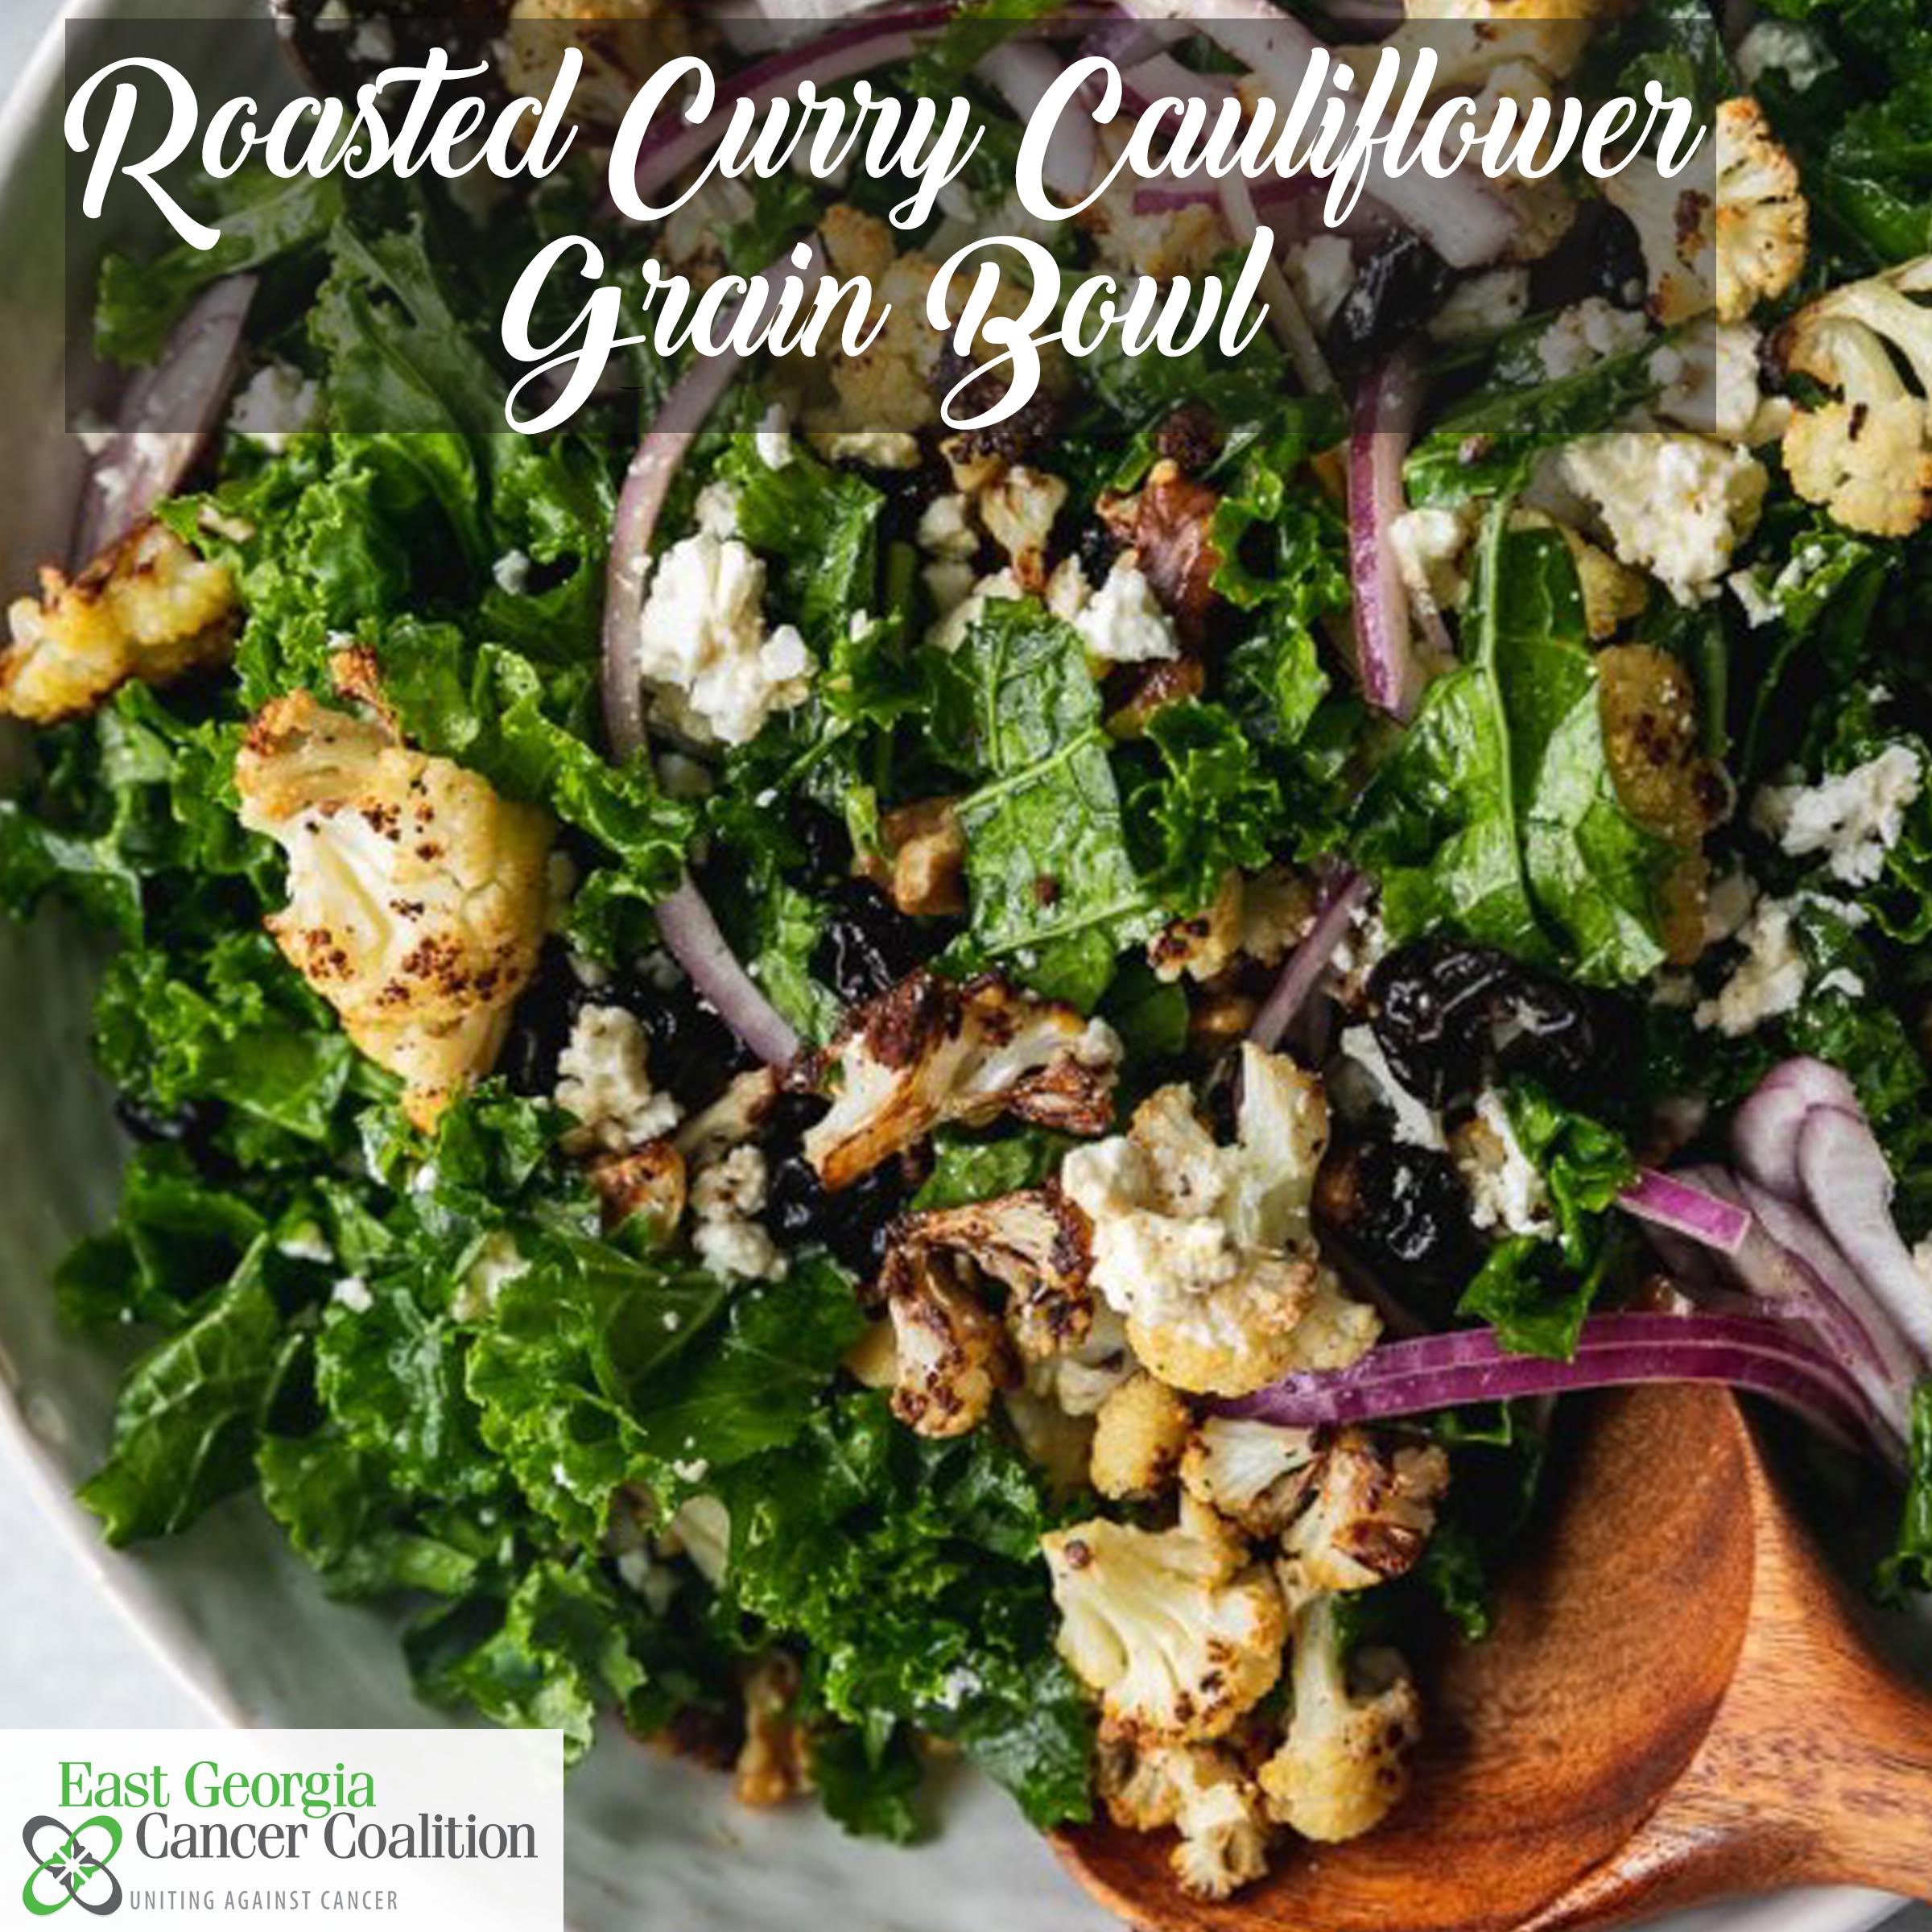 Roasted Curry Cauliflower & Grain Bowl